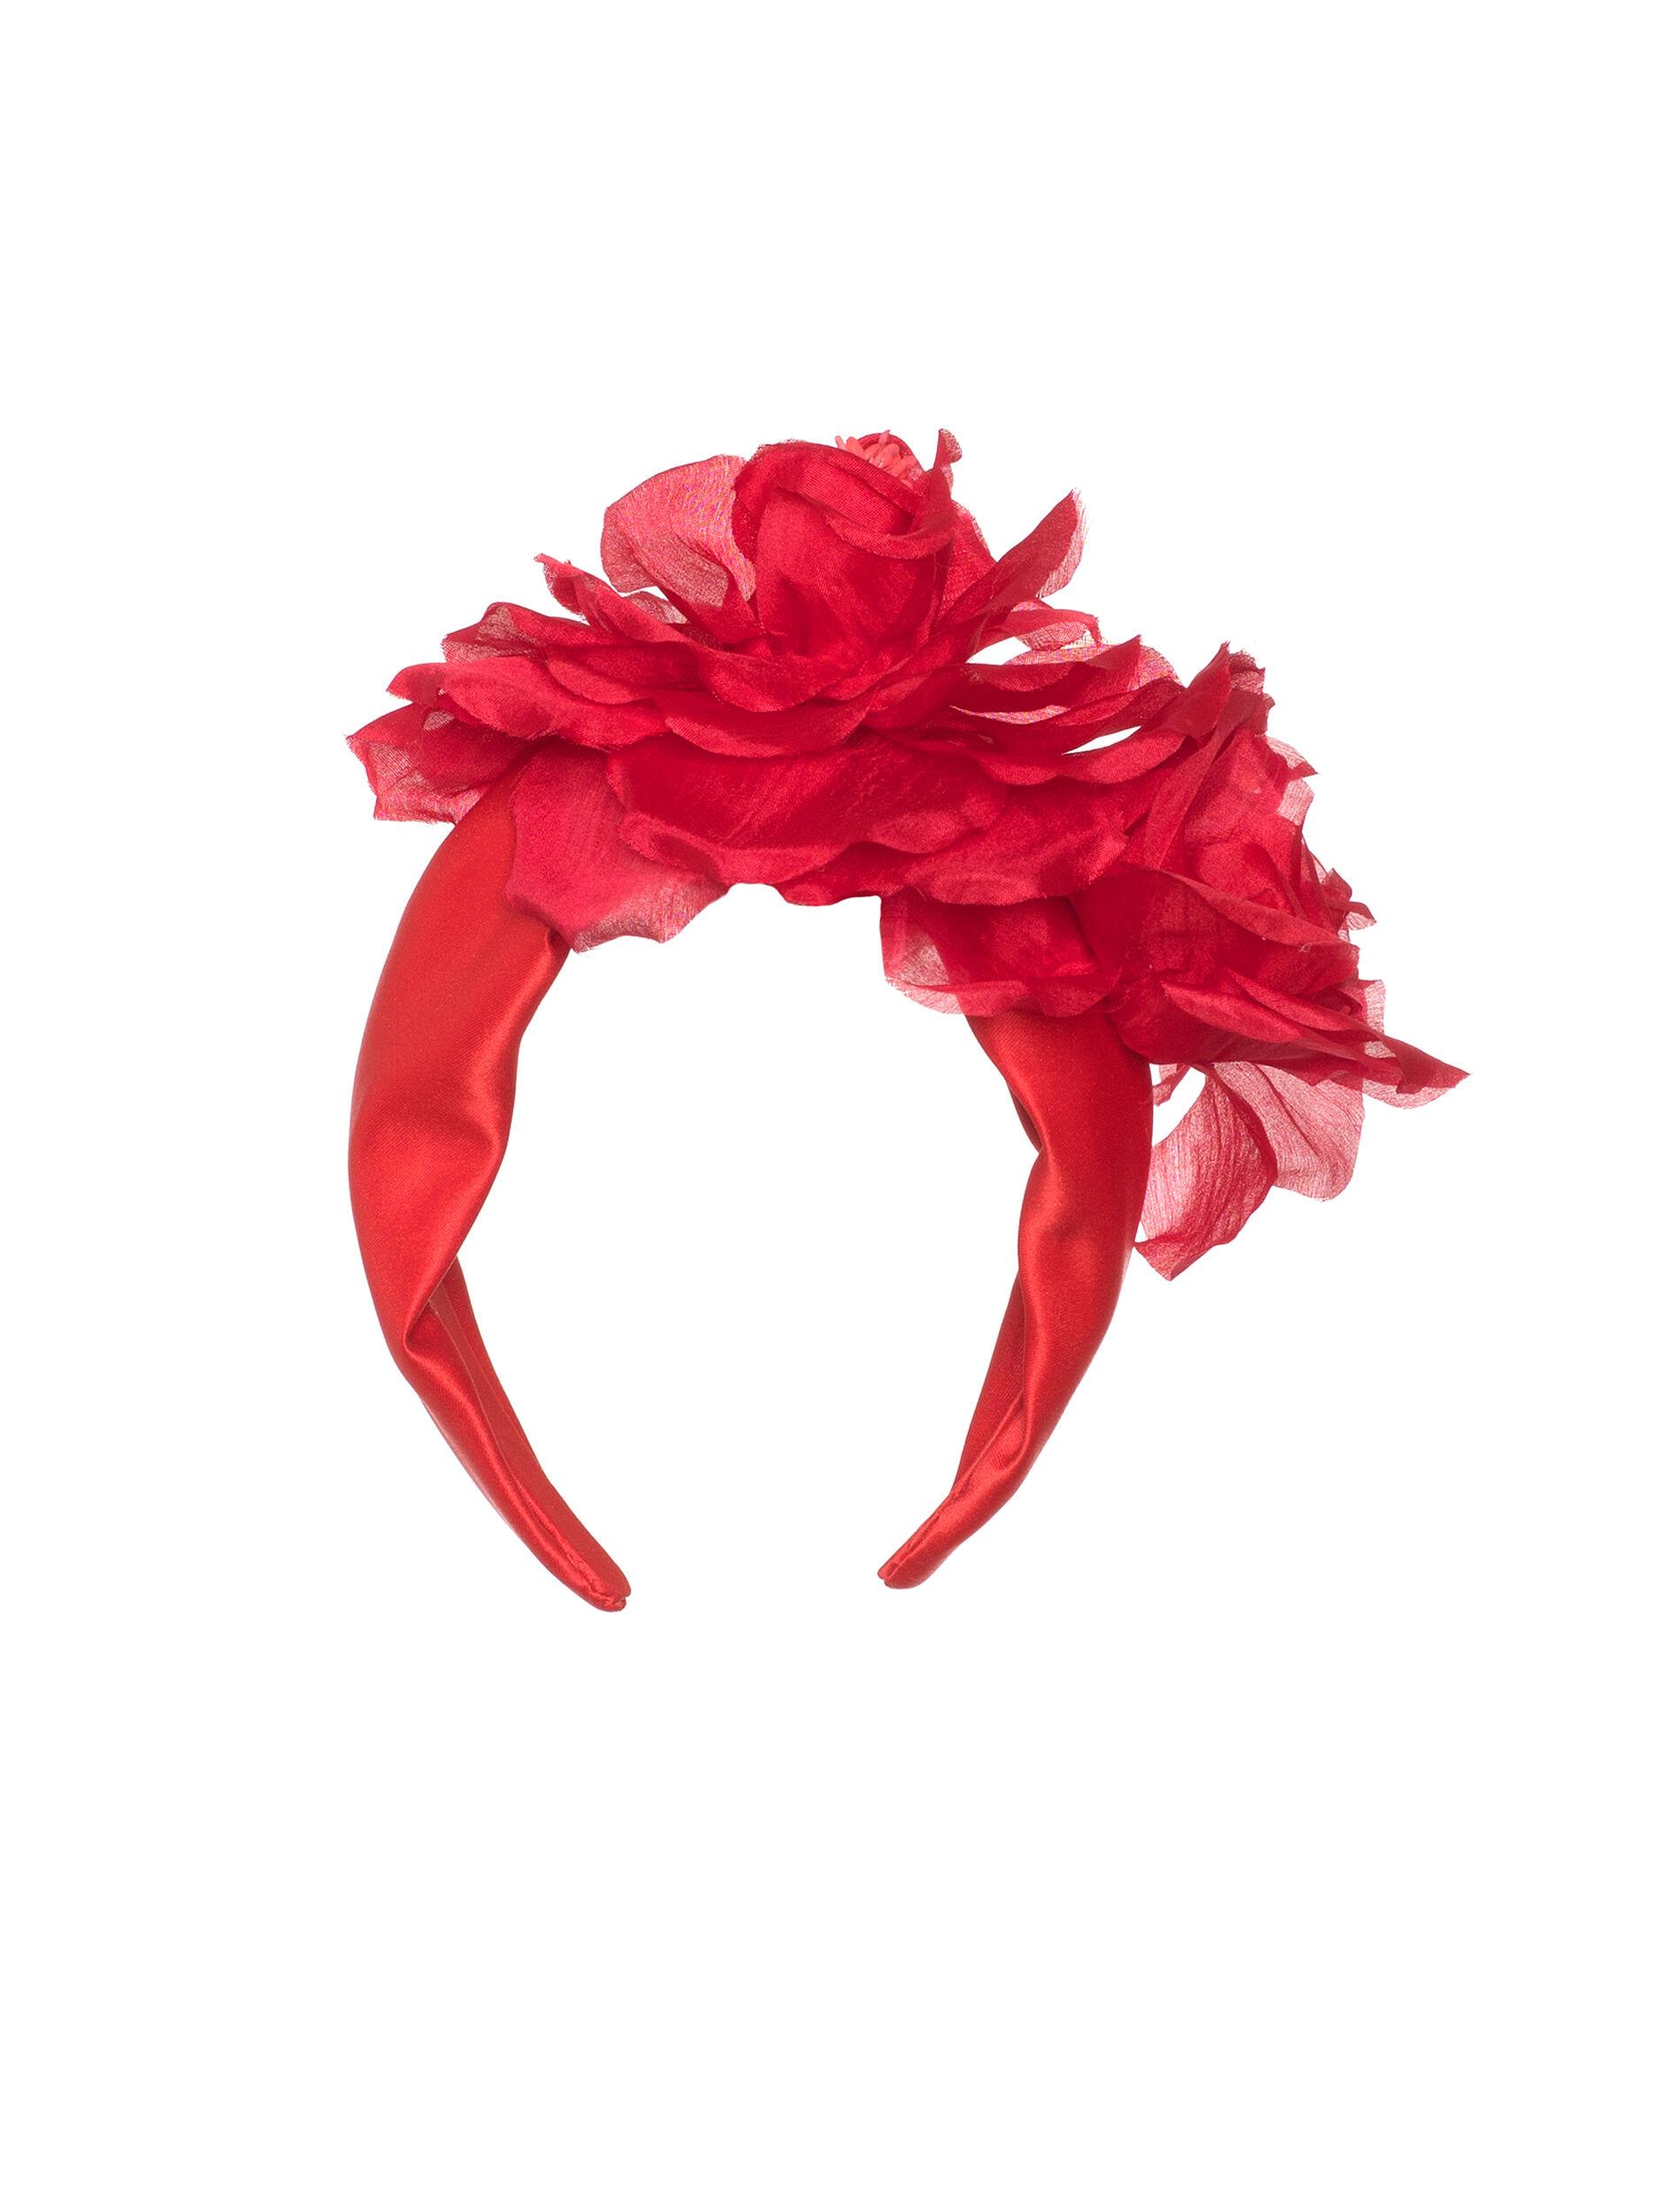 My Girl Headband